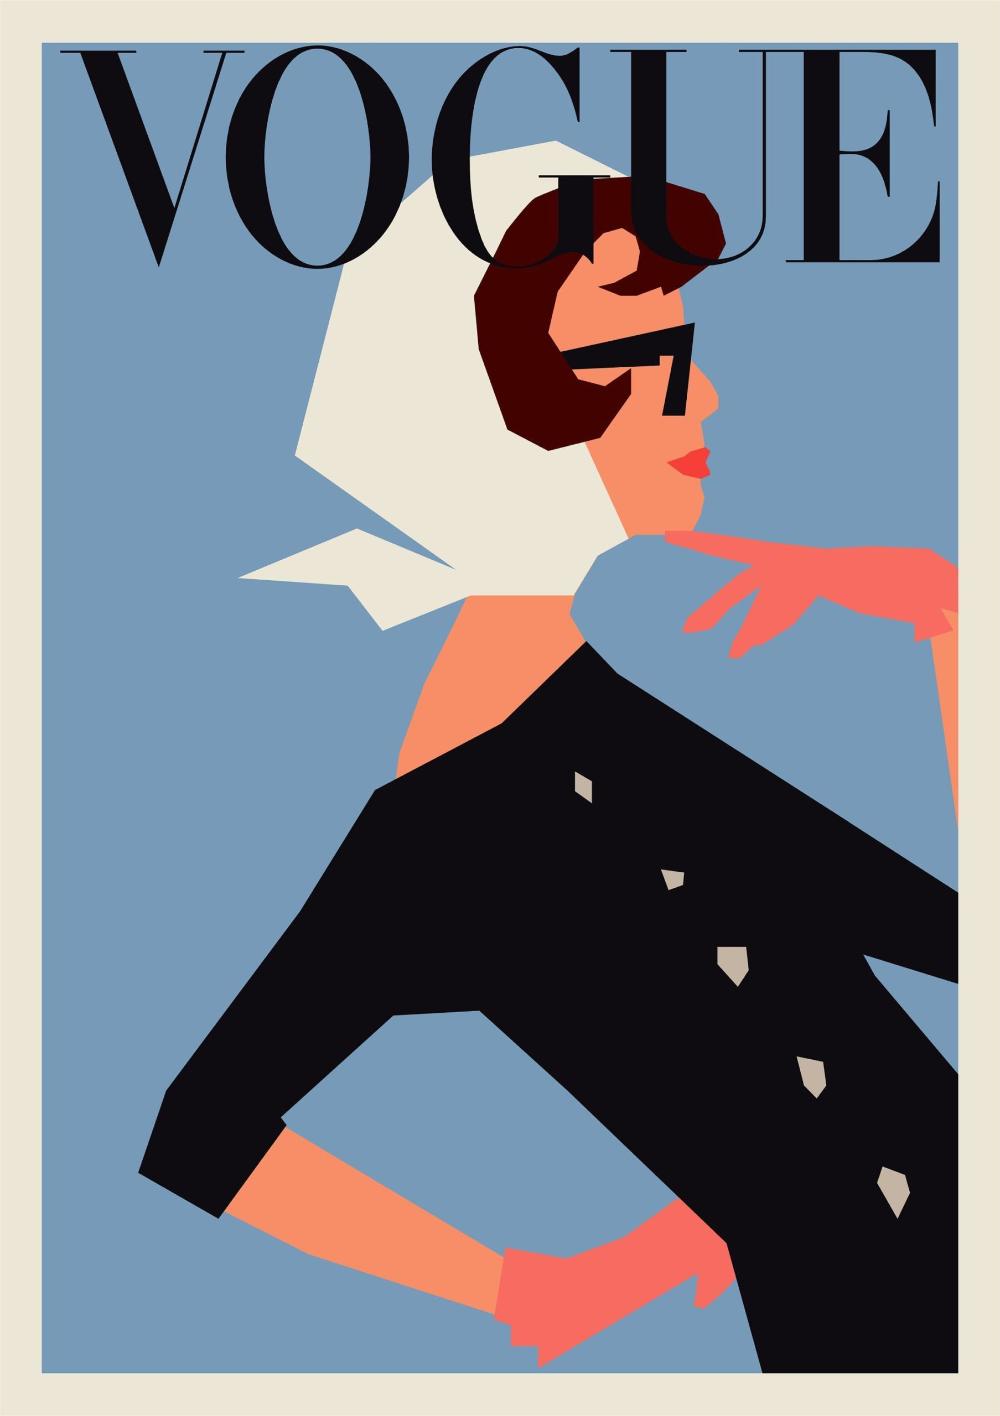 Vogue Color Poster Culture Posters 20 Off Vintage Poster Design Vintage Posters Decor Fashion Wall Art